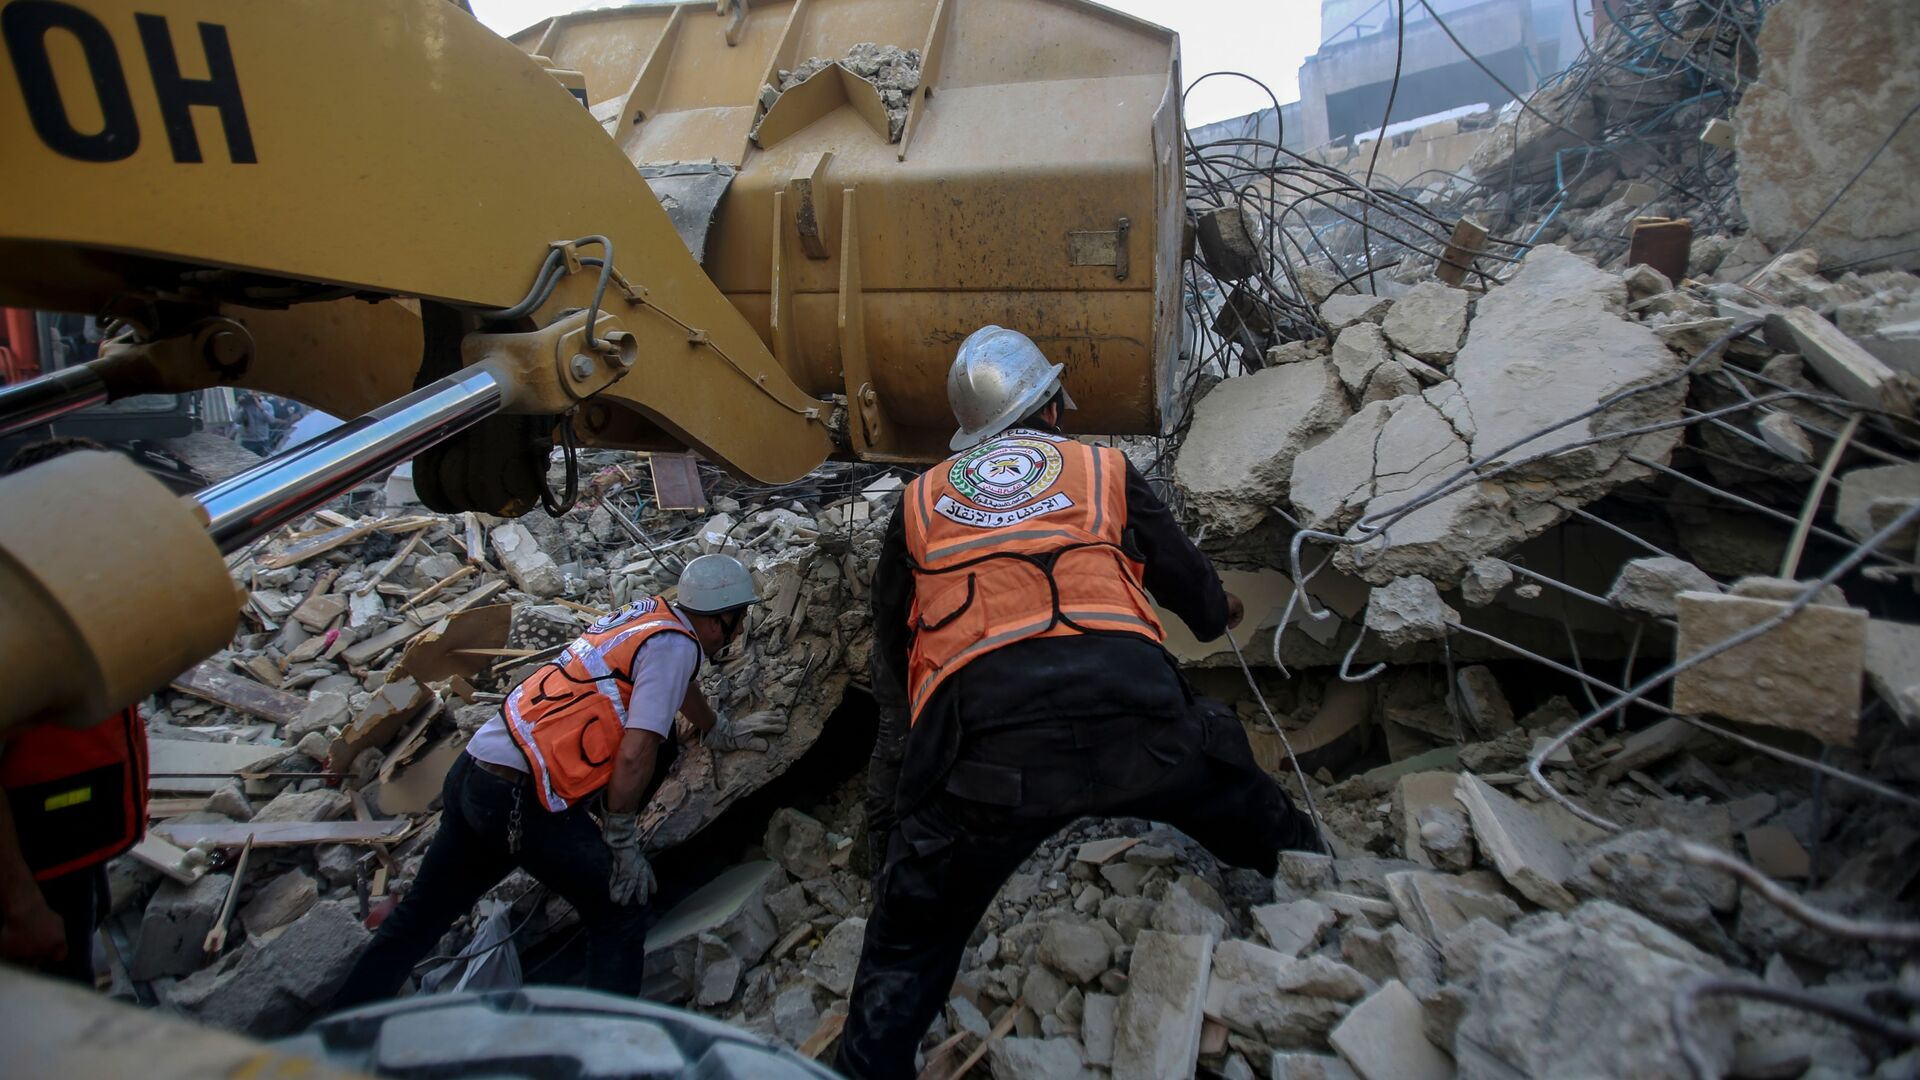 Le distruzioni a Gaza dopo i raid israeliani - Sputnik Italia, 1920, 21.05.2021